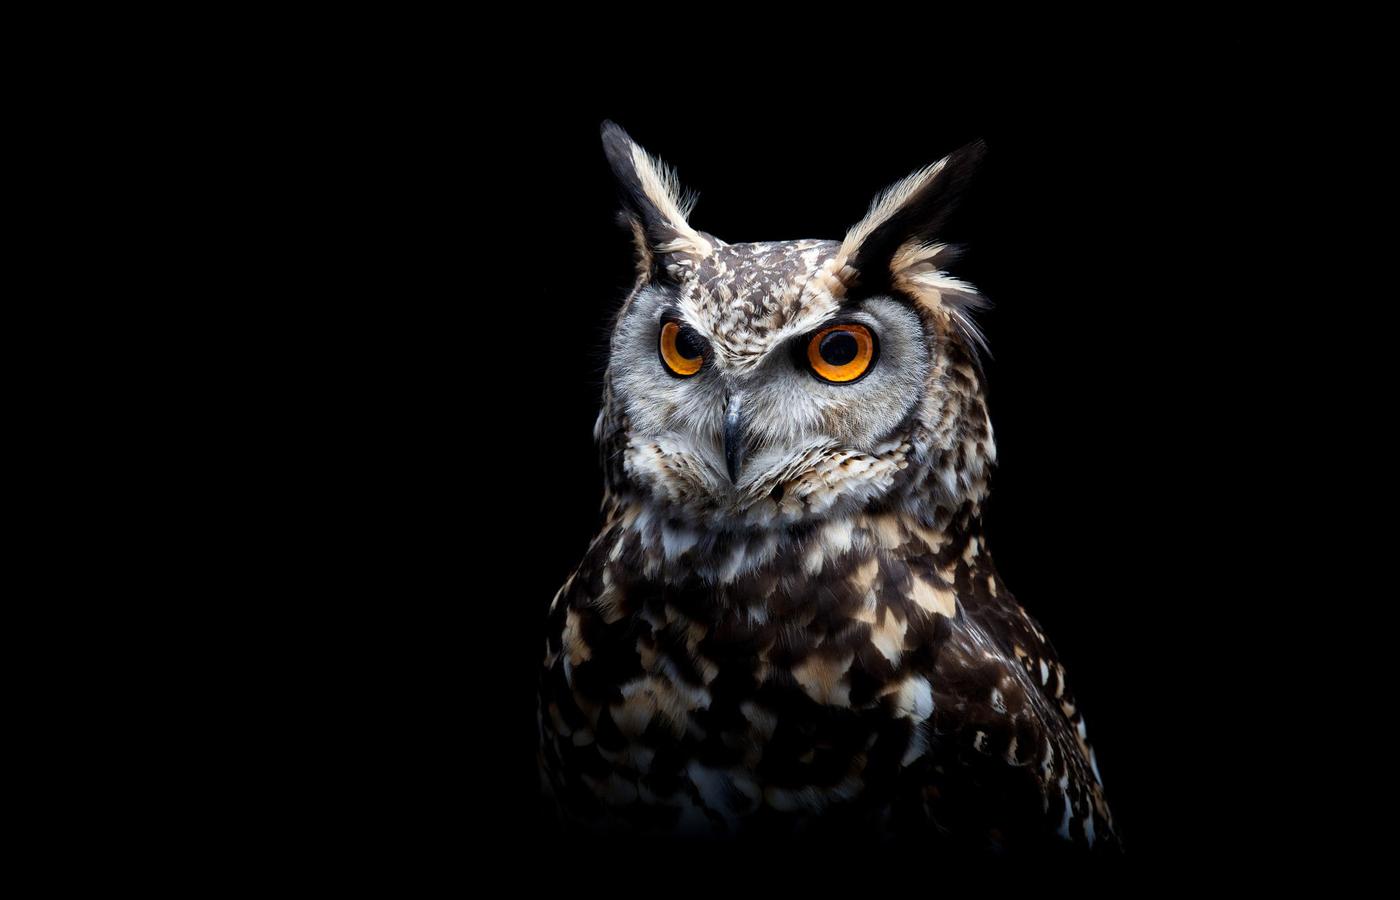 owl-dark-background-hy.jpg